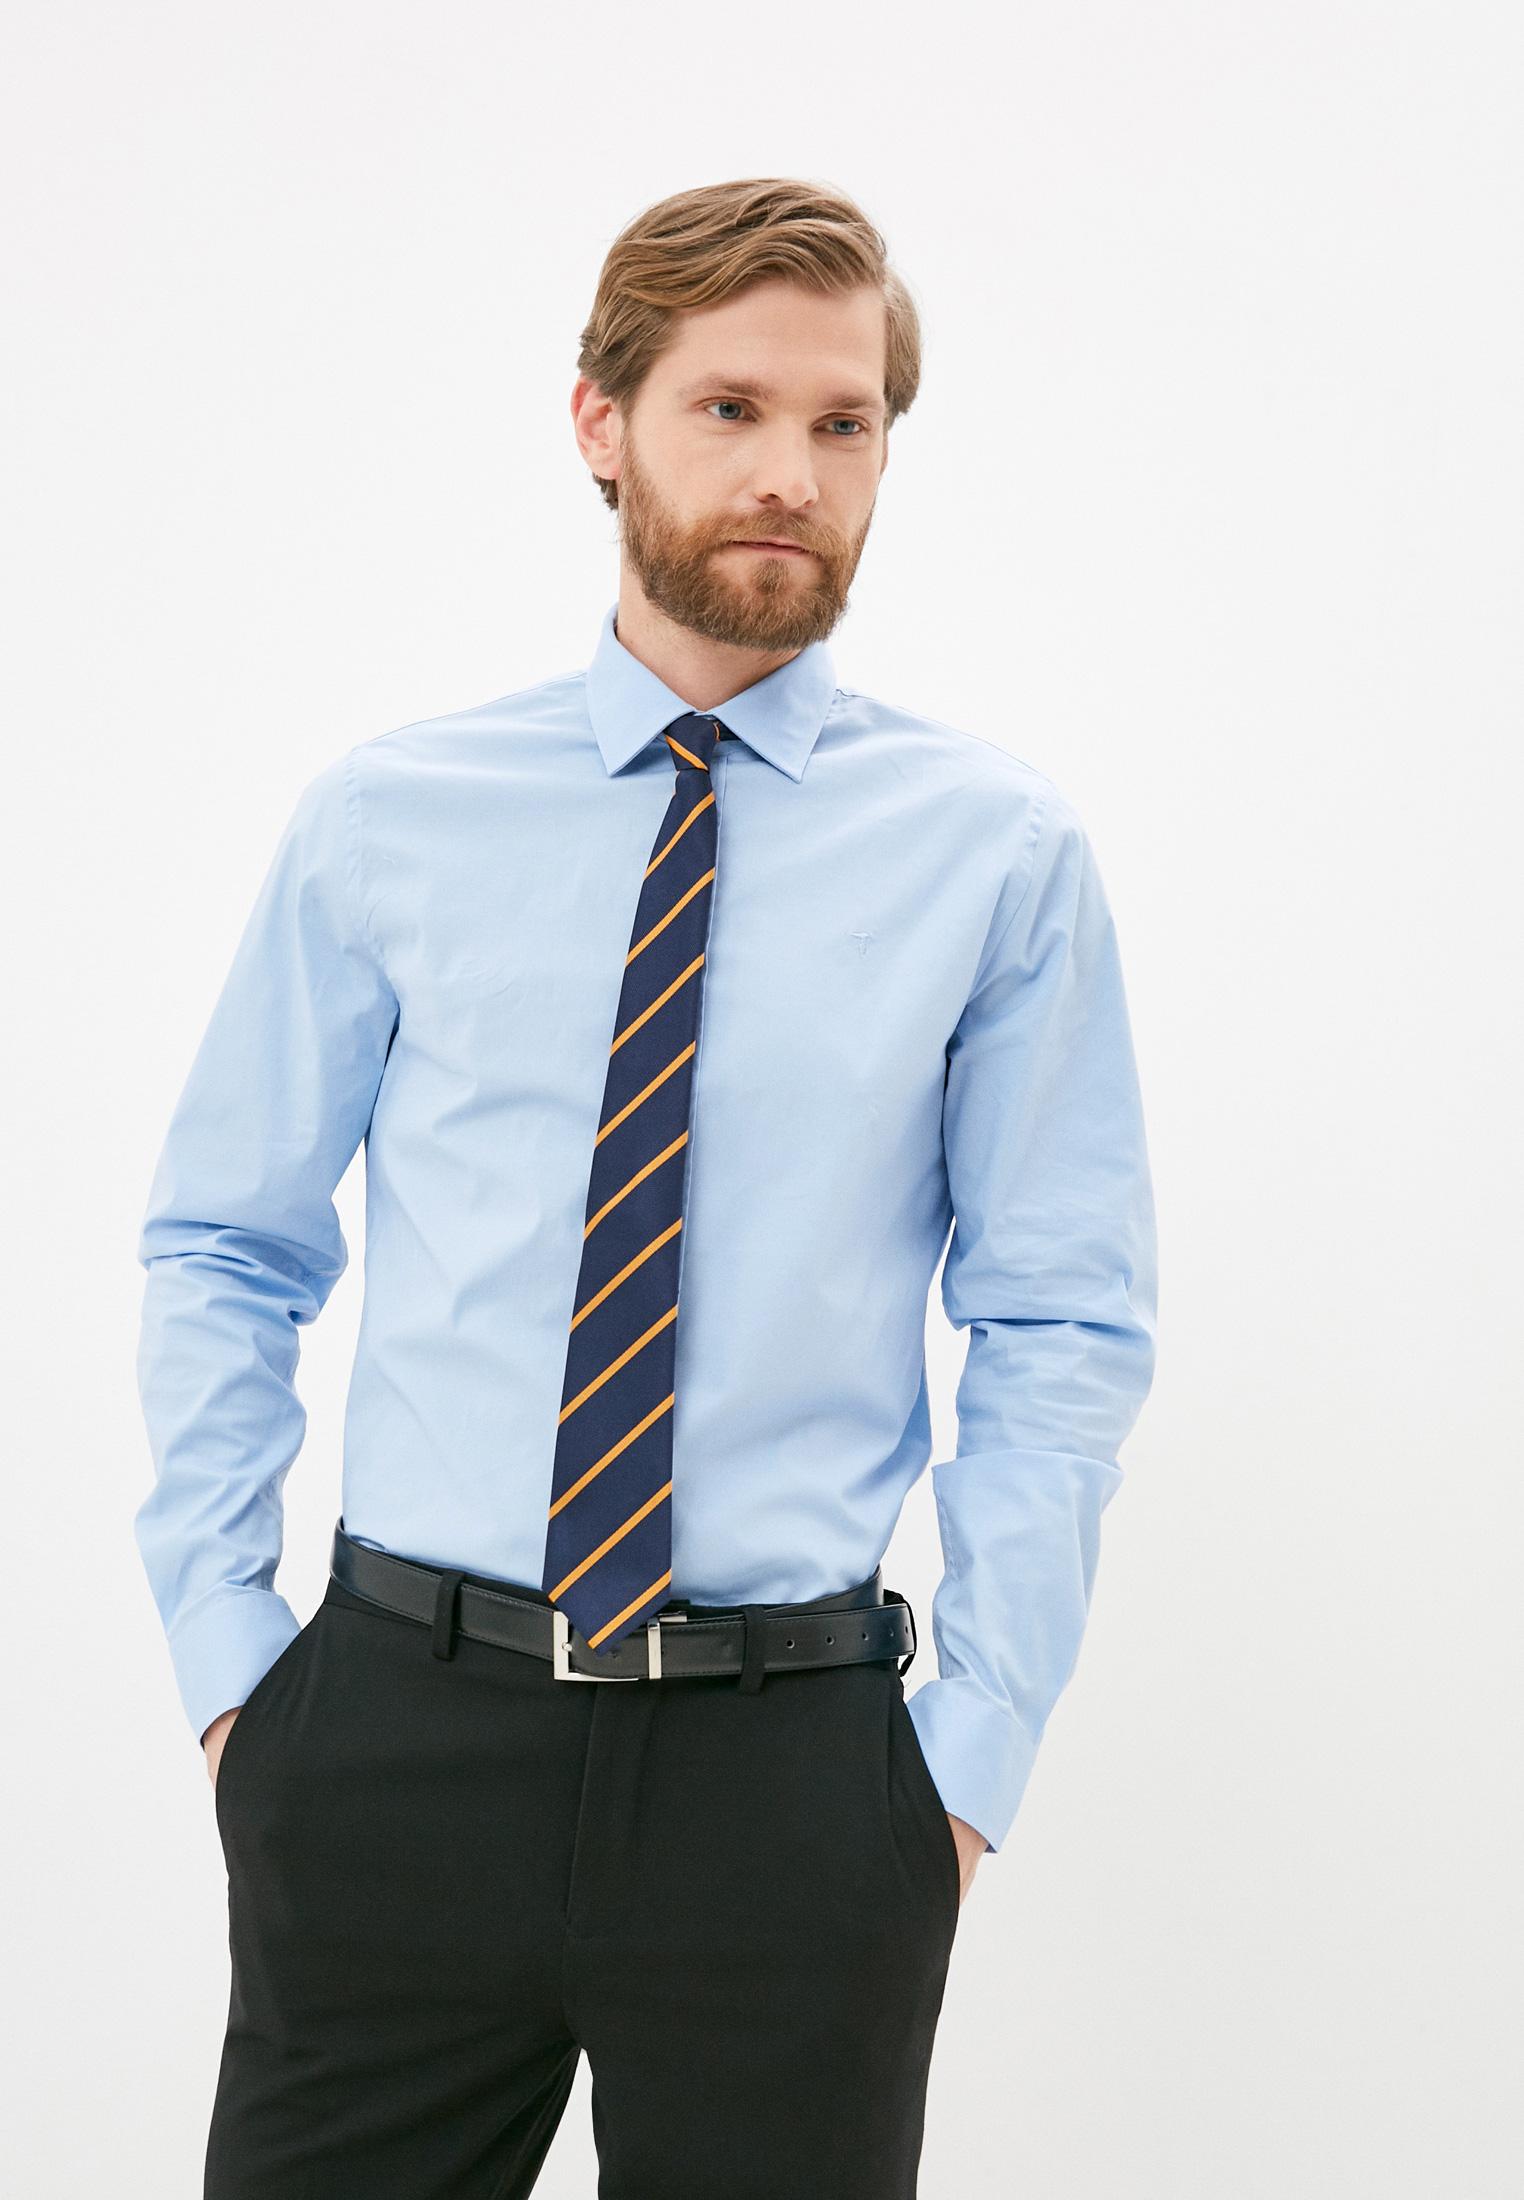 Рубашка с длинным рукавом Trussardi (Труссарди) Рубашка Trussardi